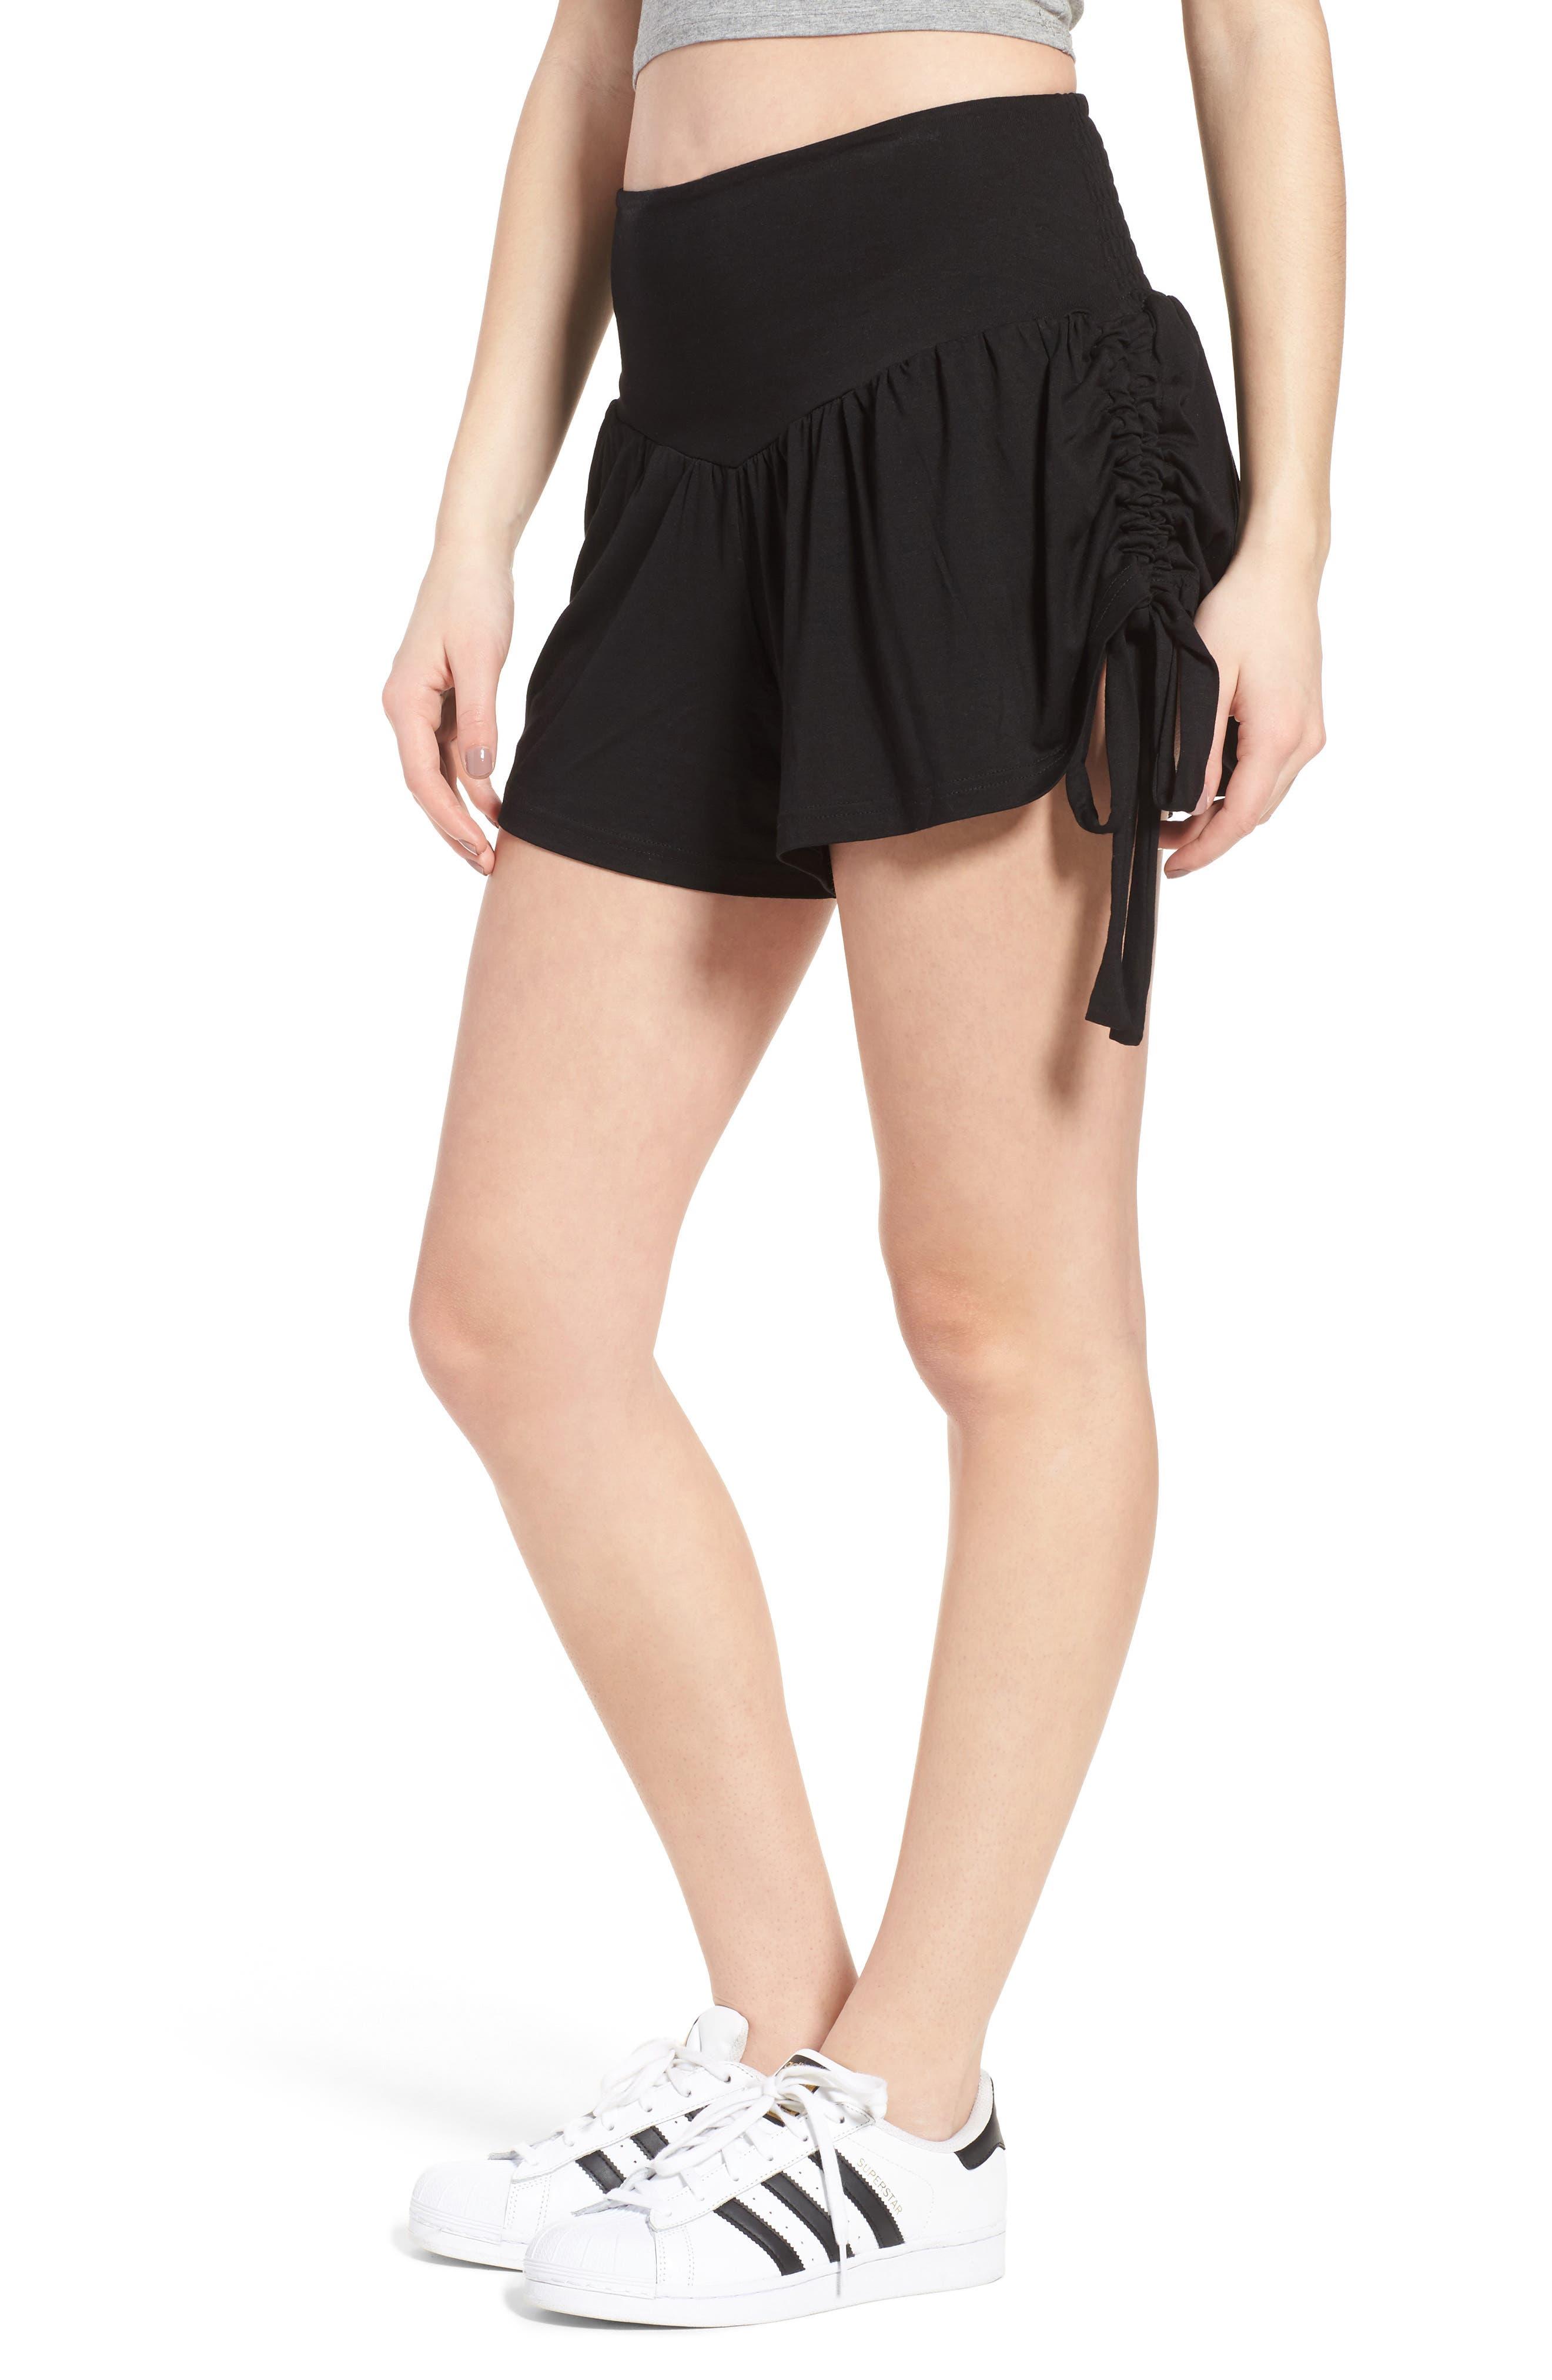 Alternate Image 1 Selected - Lira Clothing Apex Shorts